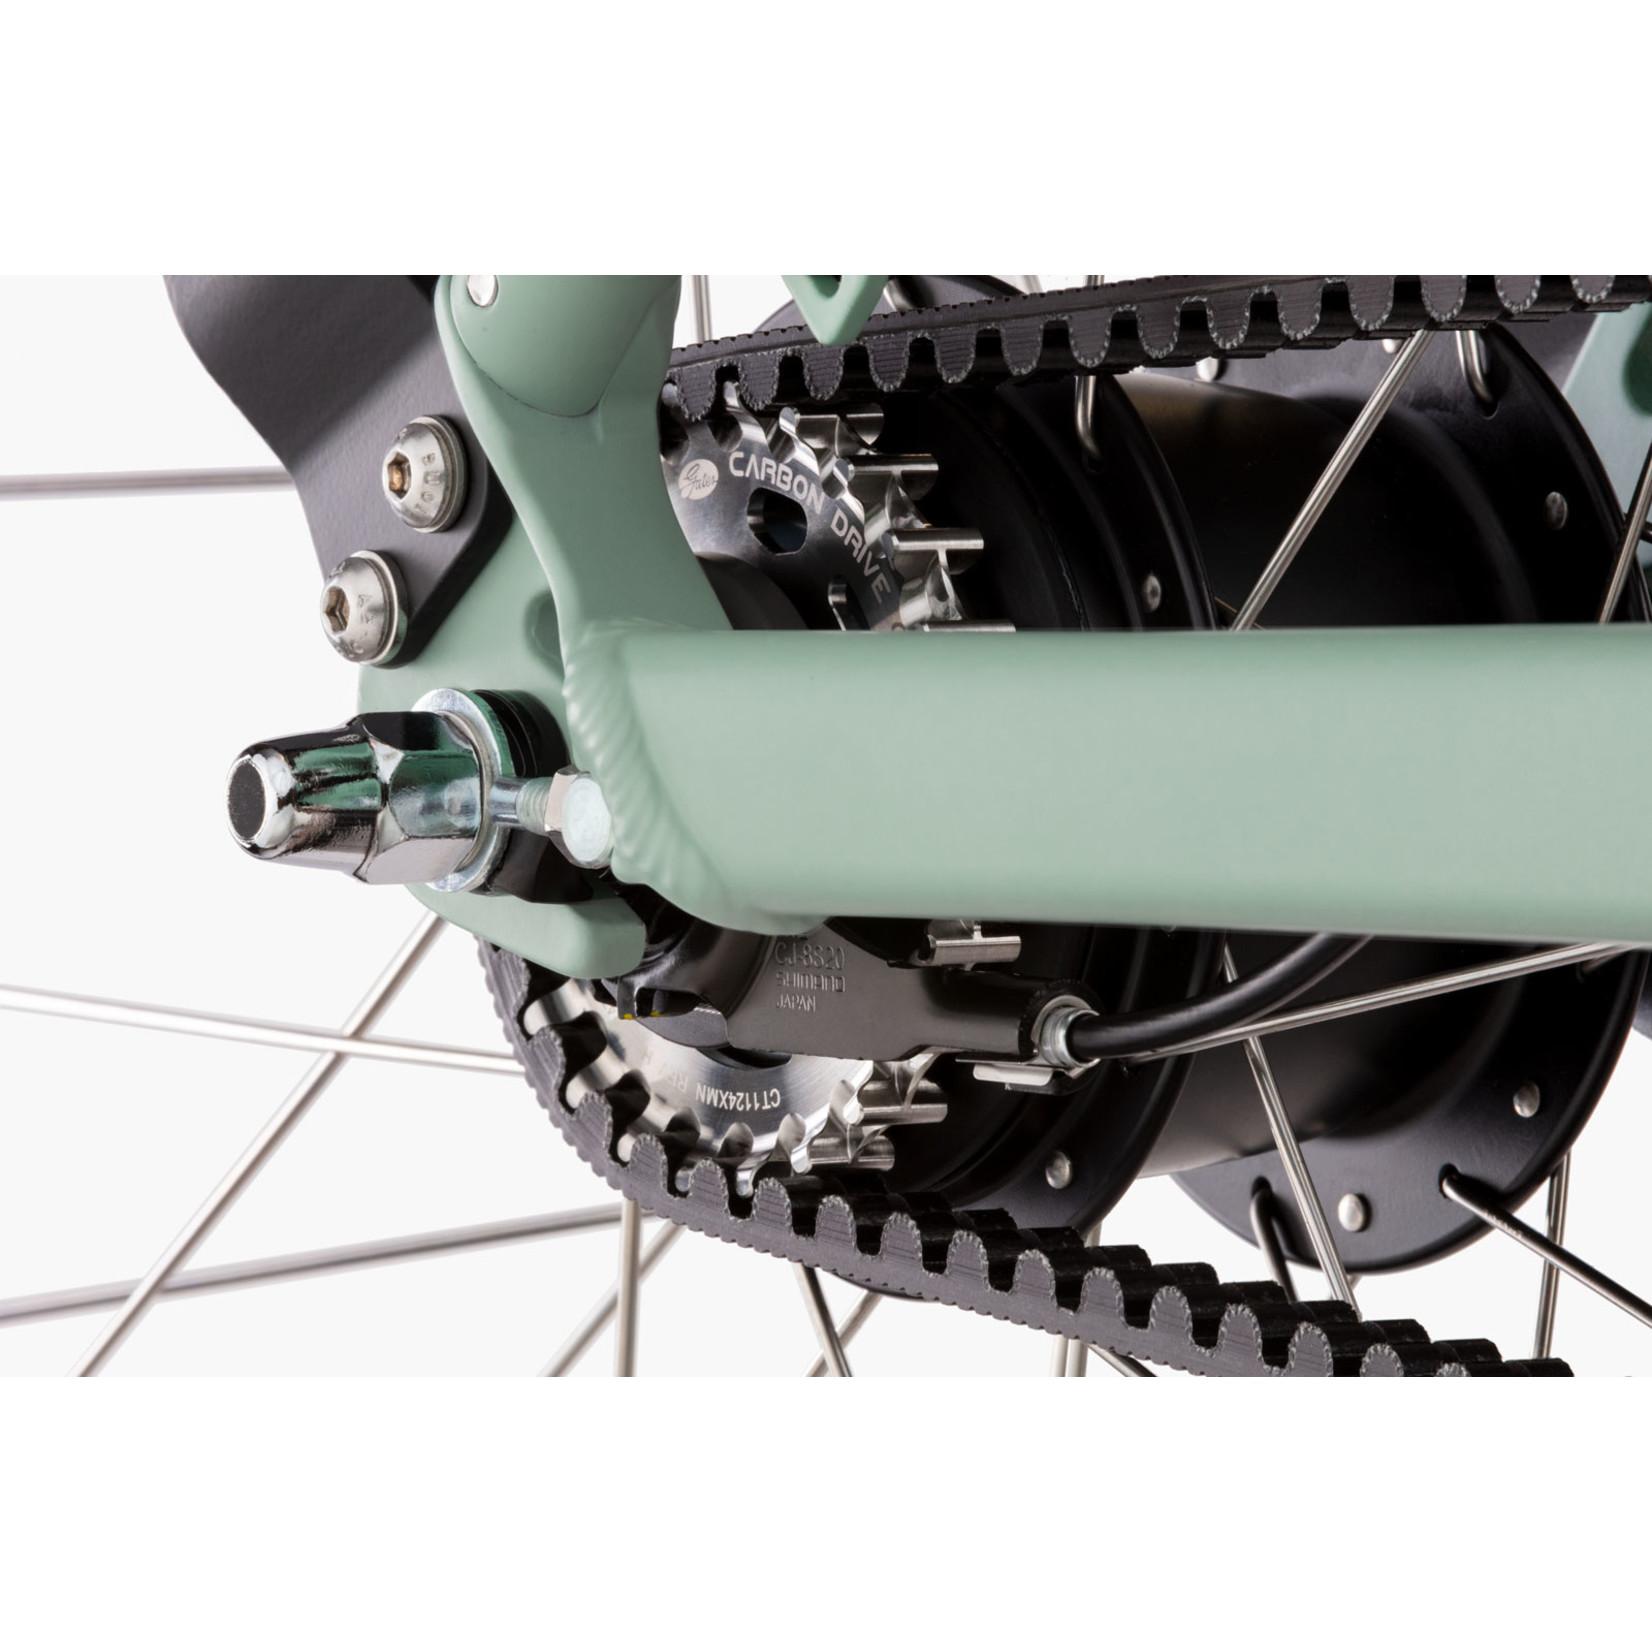 RIESE&MÜLLER RIESE&MÜLLER - Swing3 automatic - Salvia Matt - 43cm - 500Wh